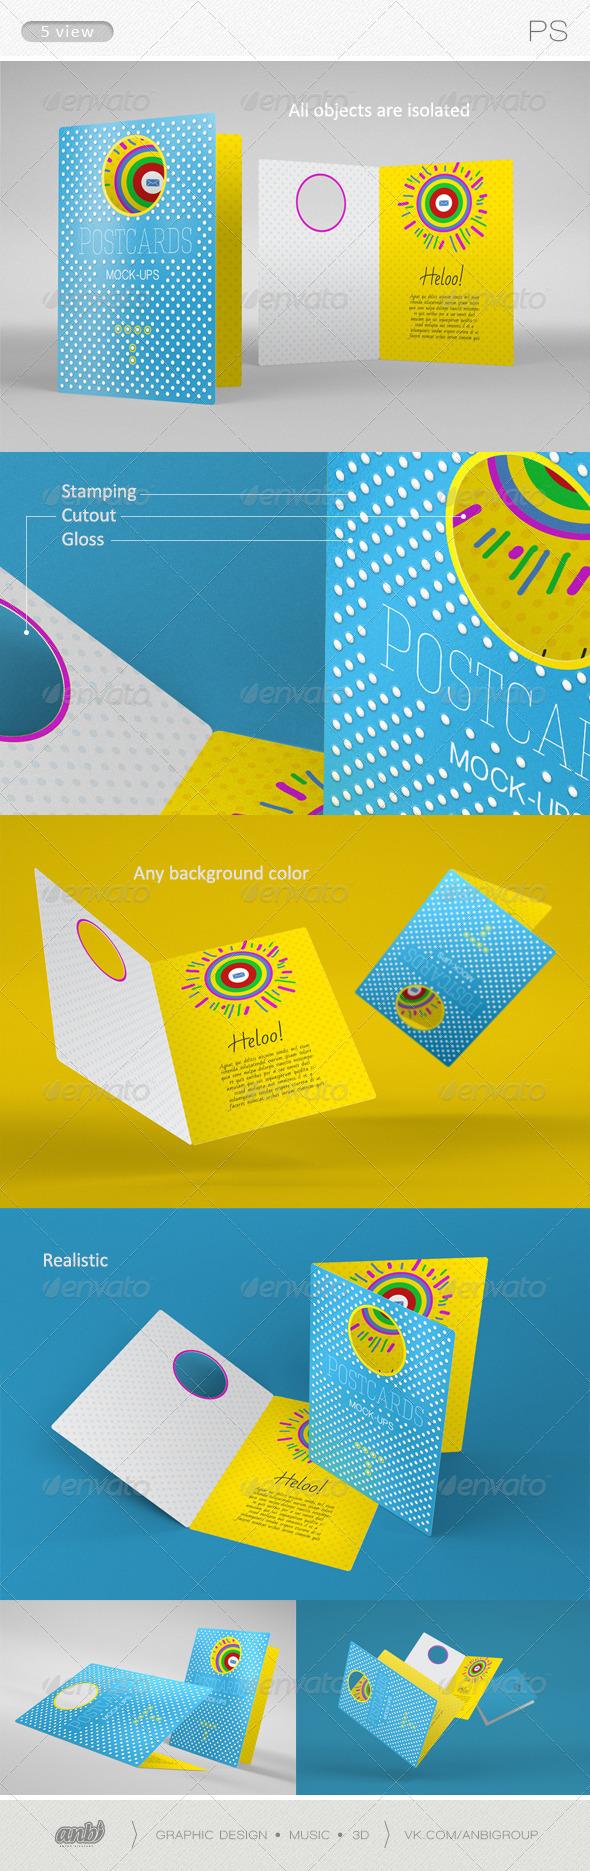 GraphicRiver Postcards Mock-ups 2 6329127